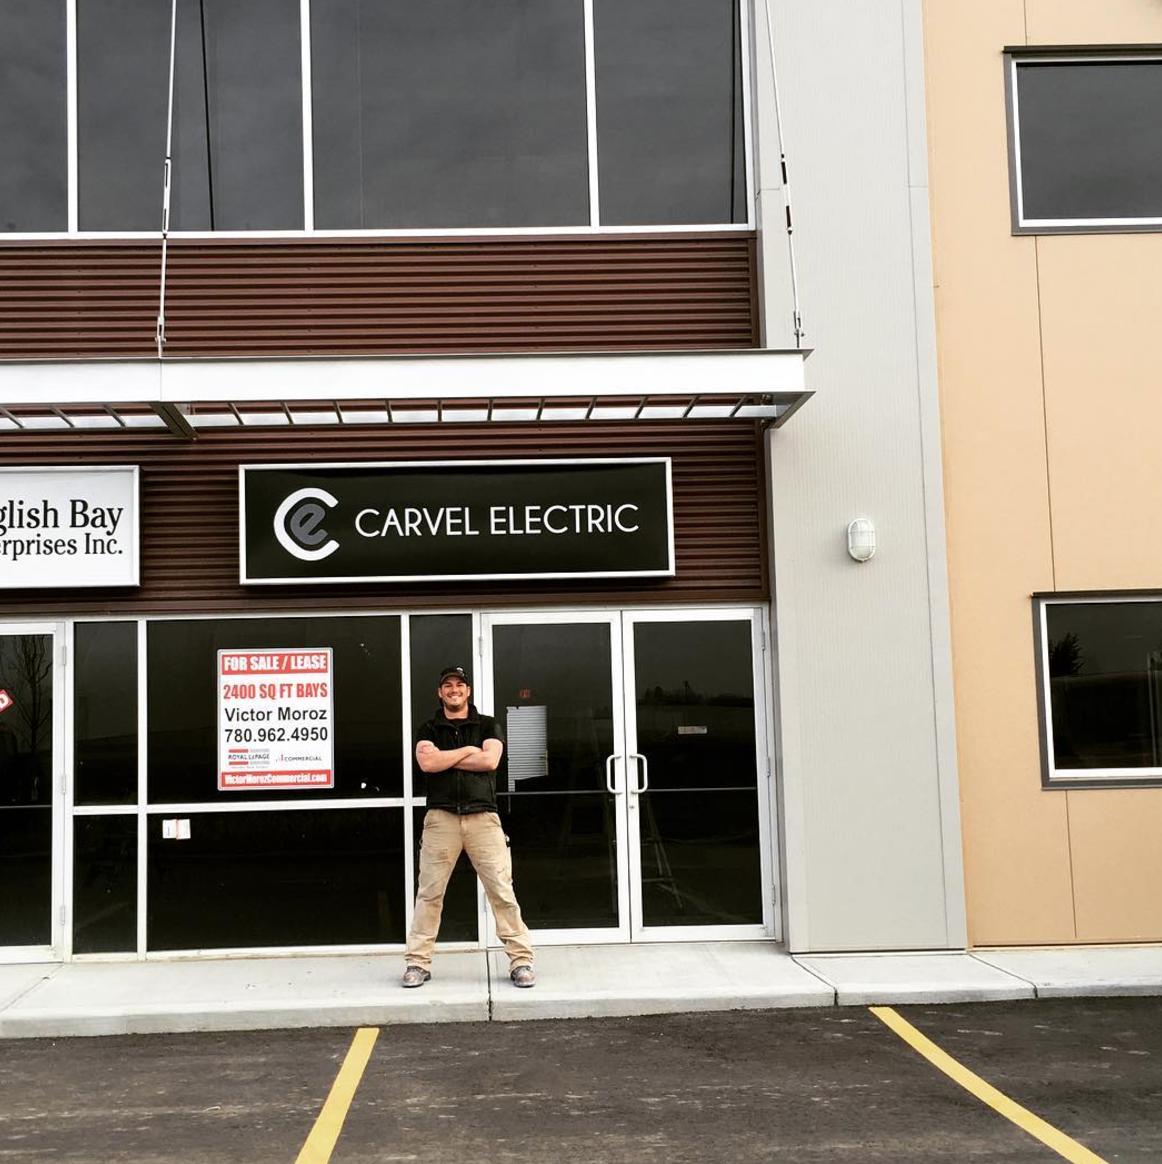 signage-carvel-electric.png